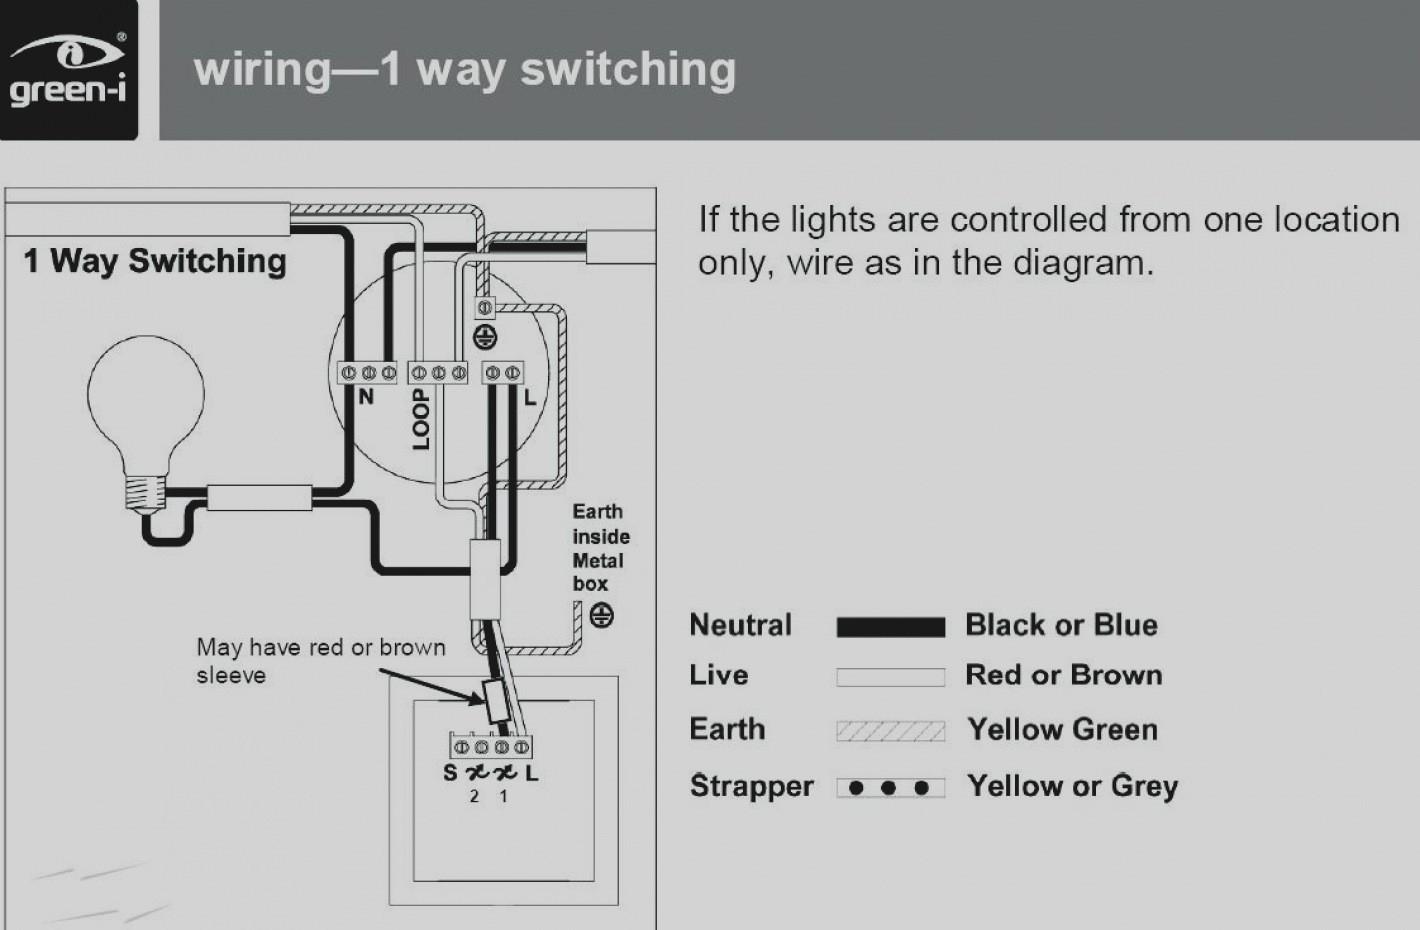 Leviton Double 3 Way Switch Wiring Diagram | Wiring Library - Leviton Decora 3 Way Switch Wiring Diagram 5603